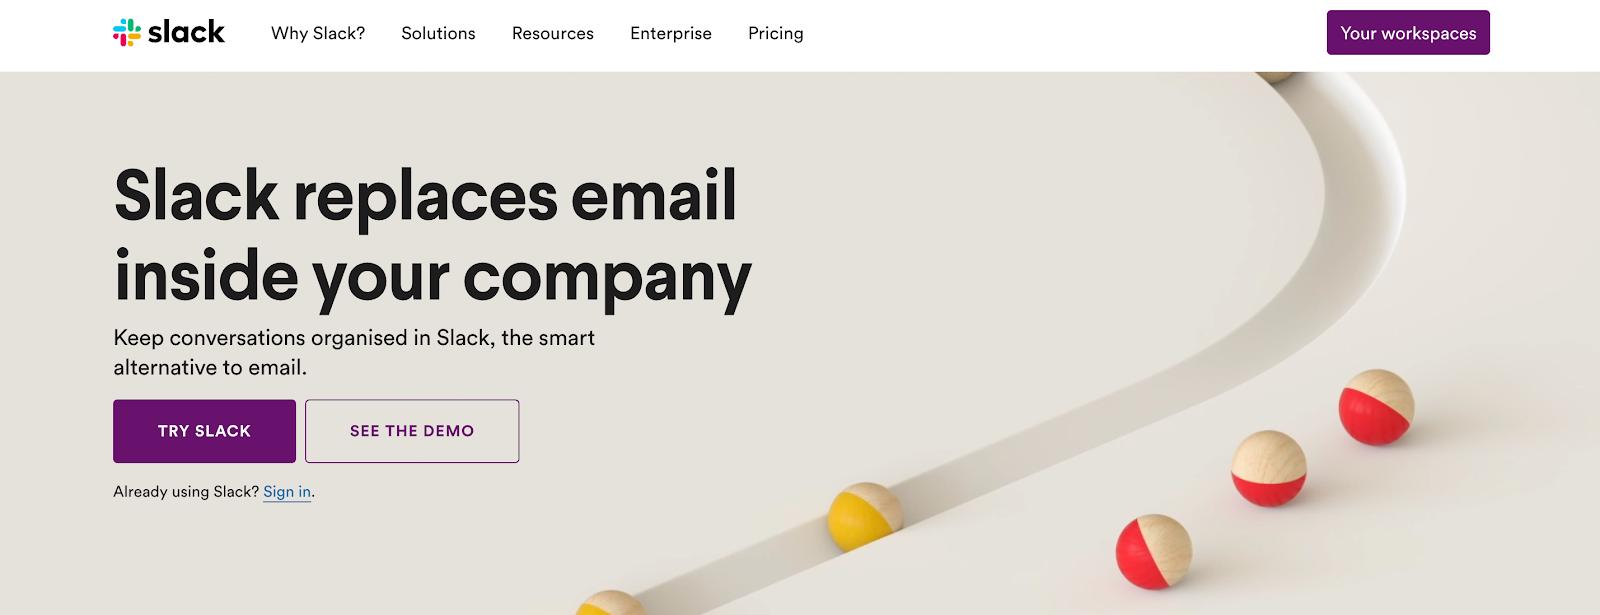 Best Homepages Online - Slack